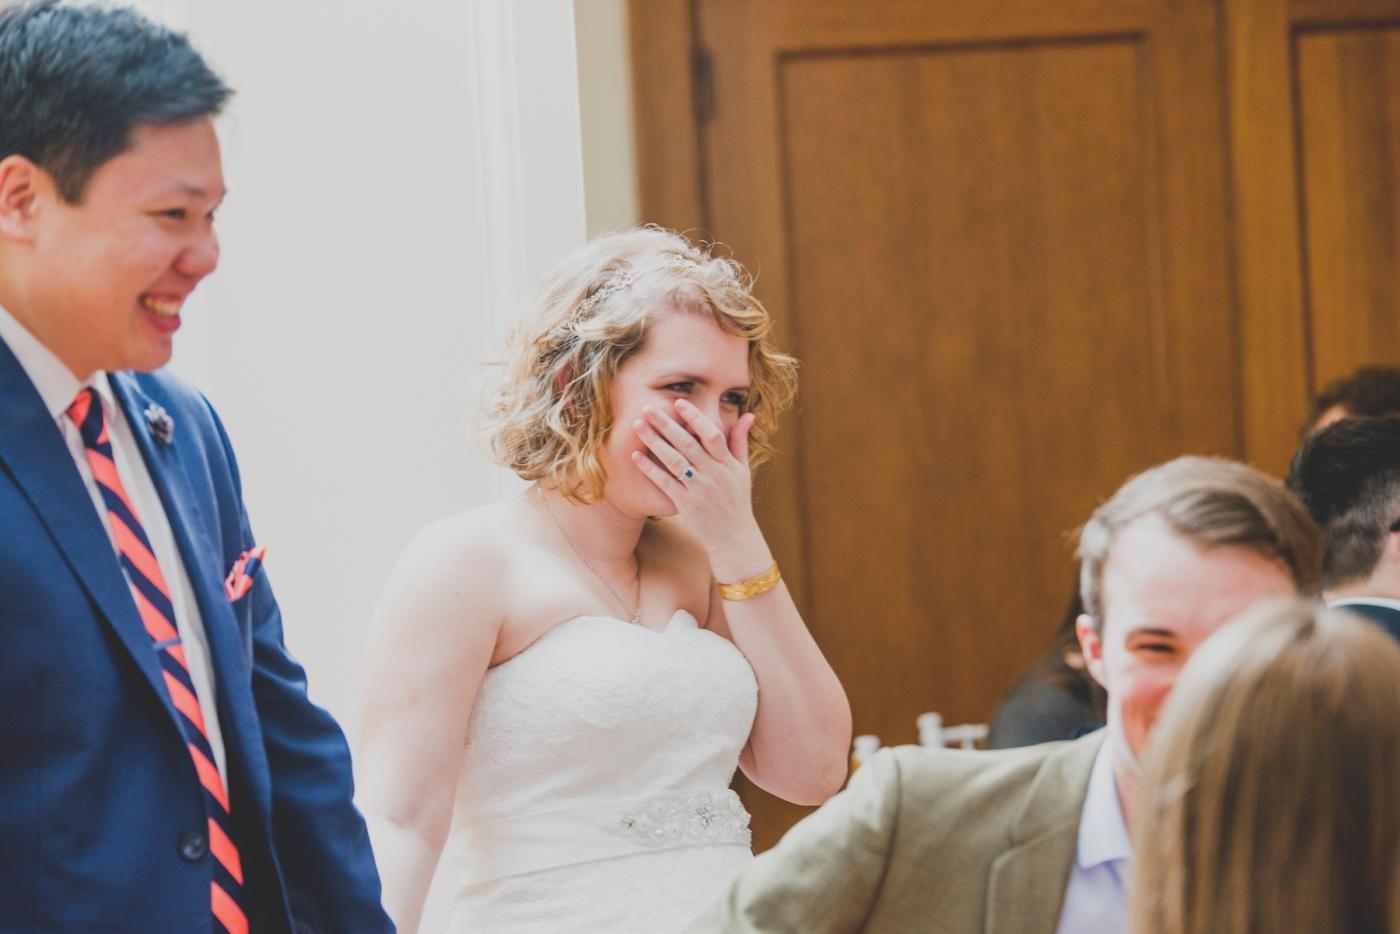 DSC_3222Everett_Wedding_Ballroom_Jane_Speleers_photography_Rachel_and_Edmund_reception_2017